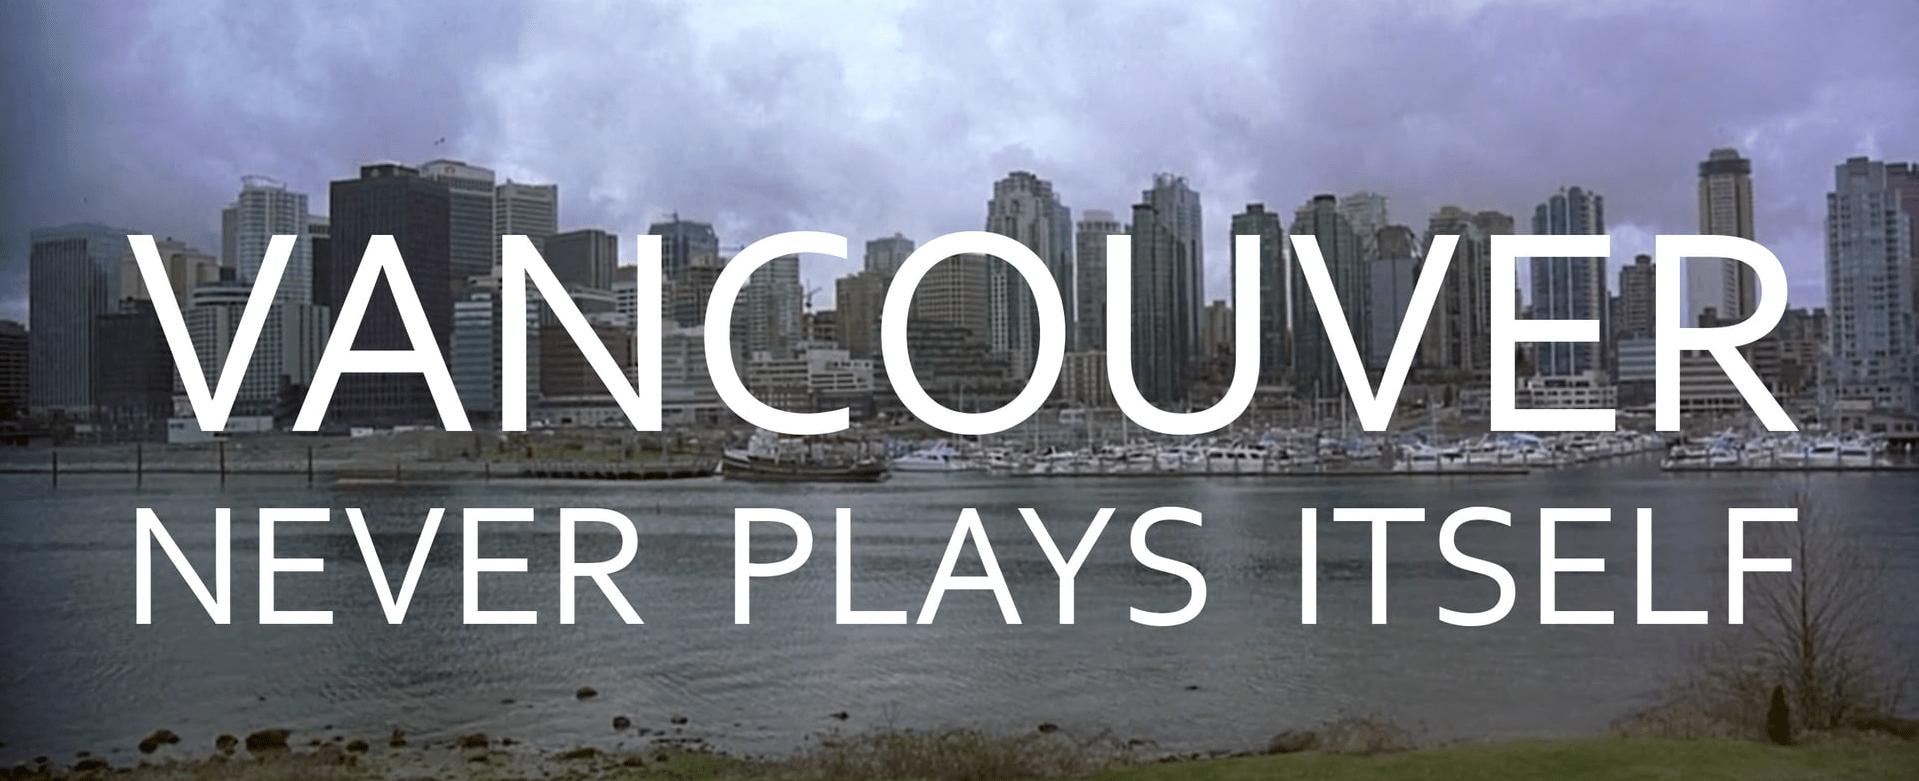 Vancouver Never Plays Itself (Everyframeapainting) - thescriptblog.com